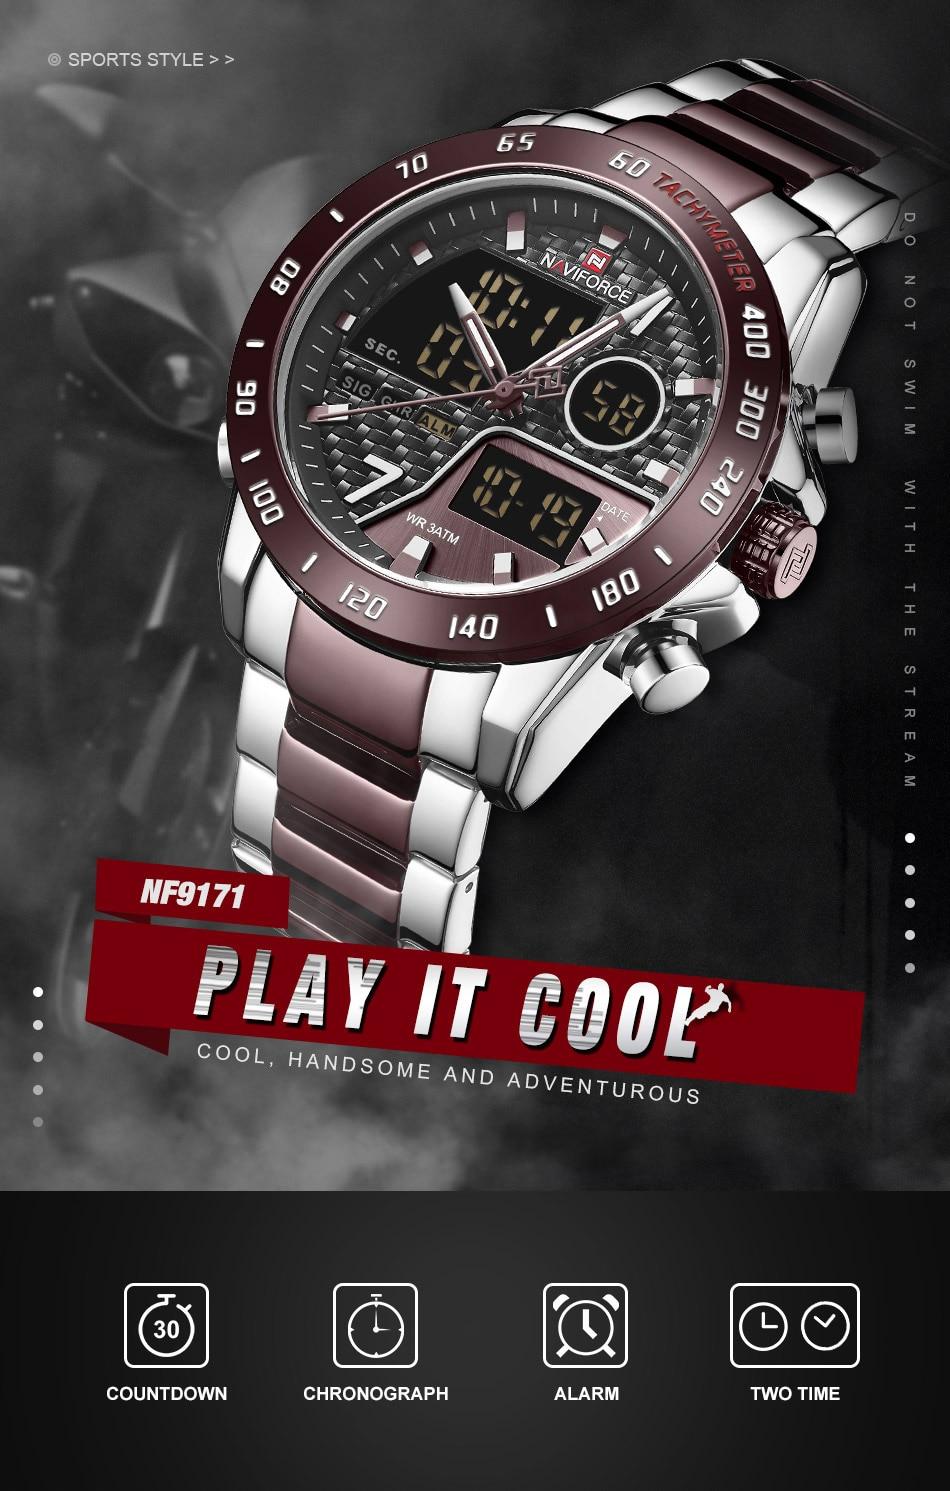 Hdb3a36c6e90246228b1150fcf1a46c91g NAVIFORCE Men Digital Watch LED Sport Military Mens Quartz Wristwatch Male Luminous Waterproof Clock Watches Relogio Masculino